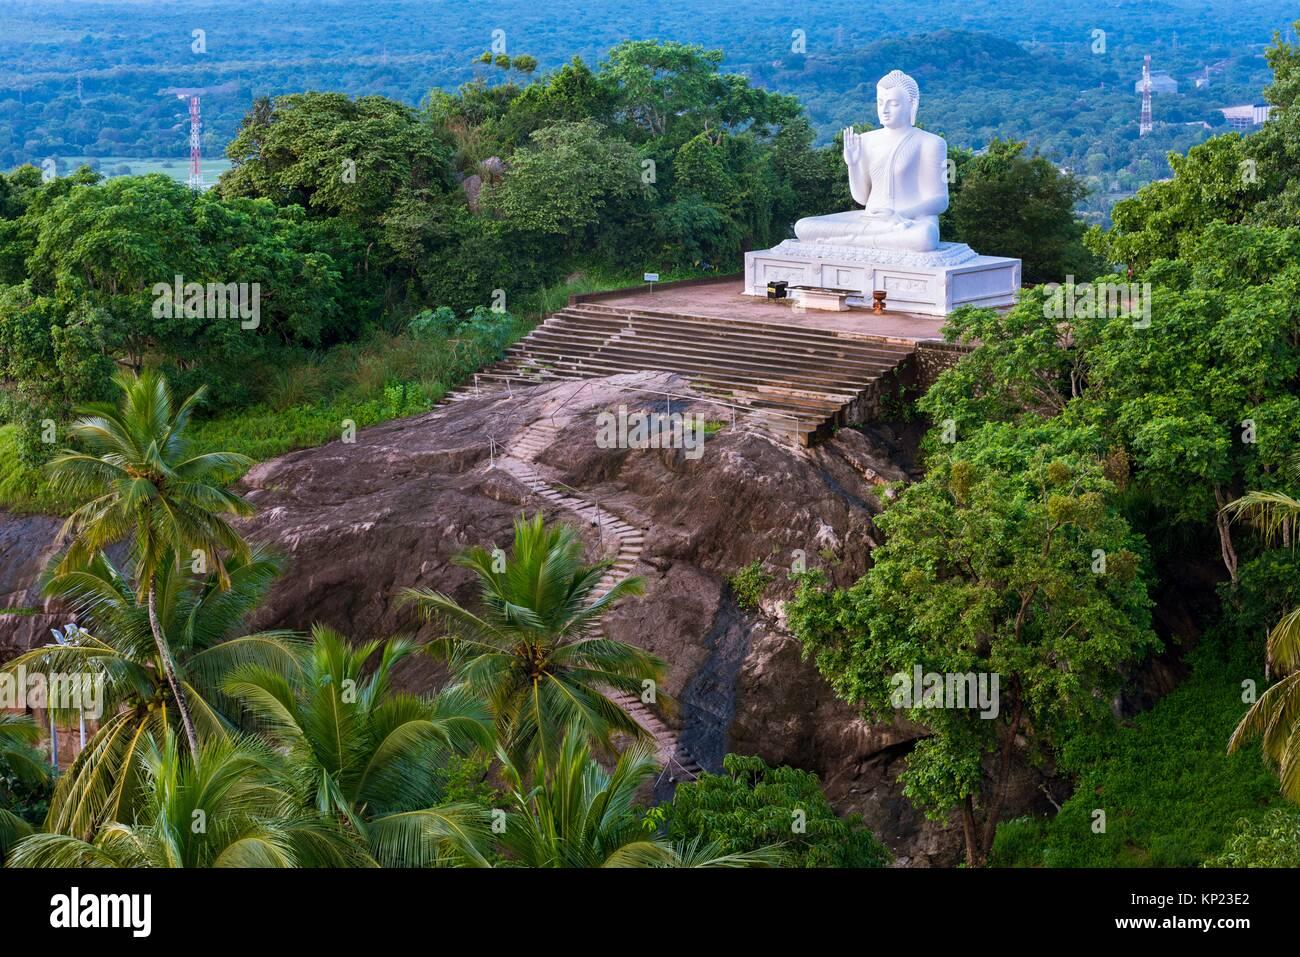 Giant Seated Buddha at Mihintale Monastery, Anuradhapura District, North Central Province, Sri Lanka, Asia. Stock Photo